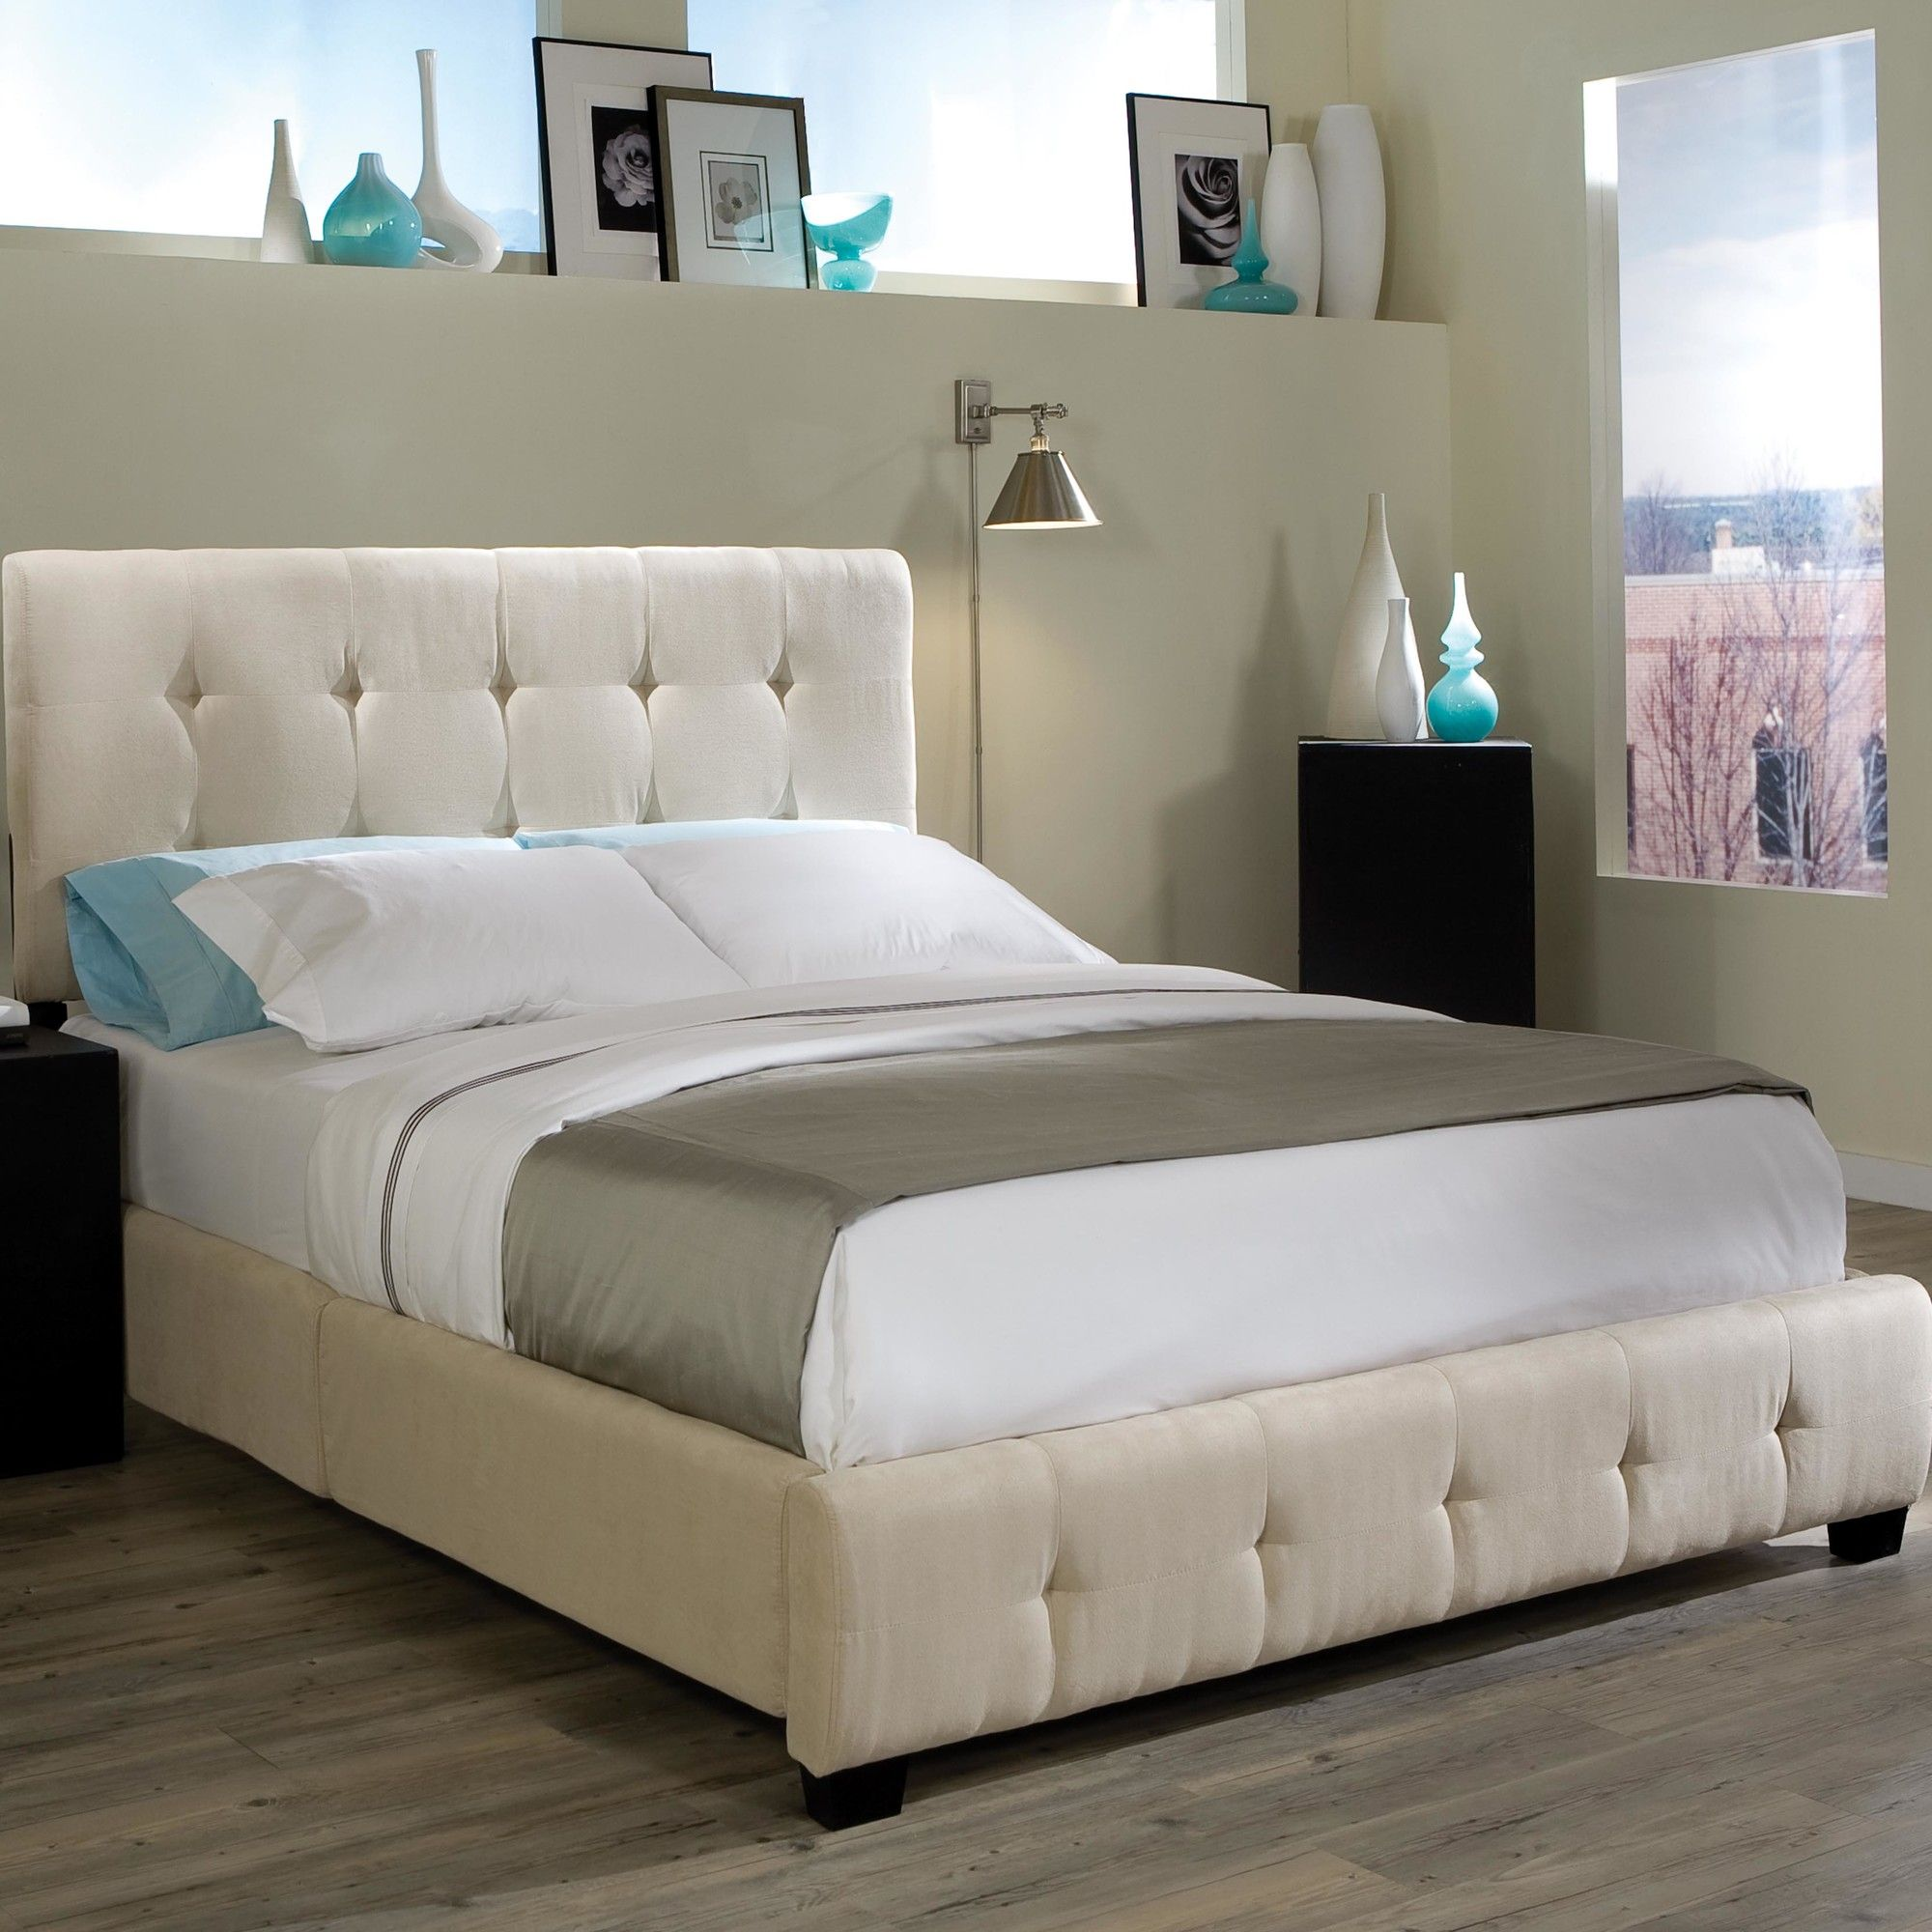 Haynesville Upholstered Standard Bed Кровать, Спальня